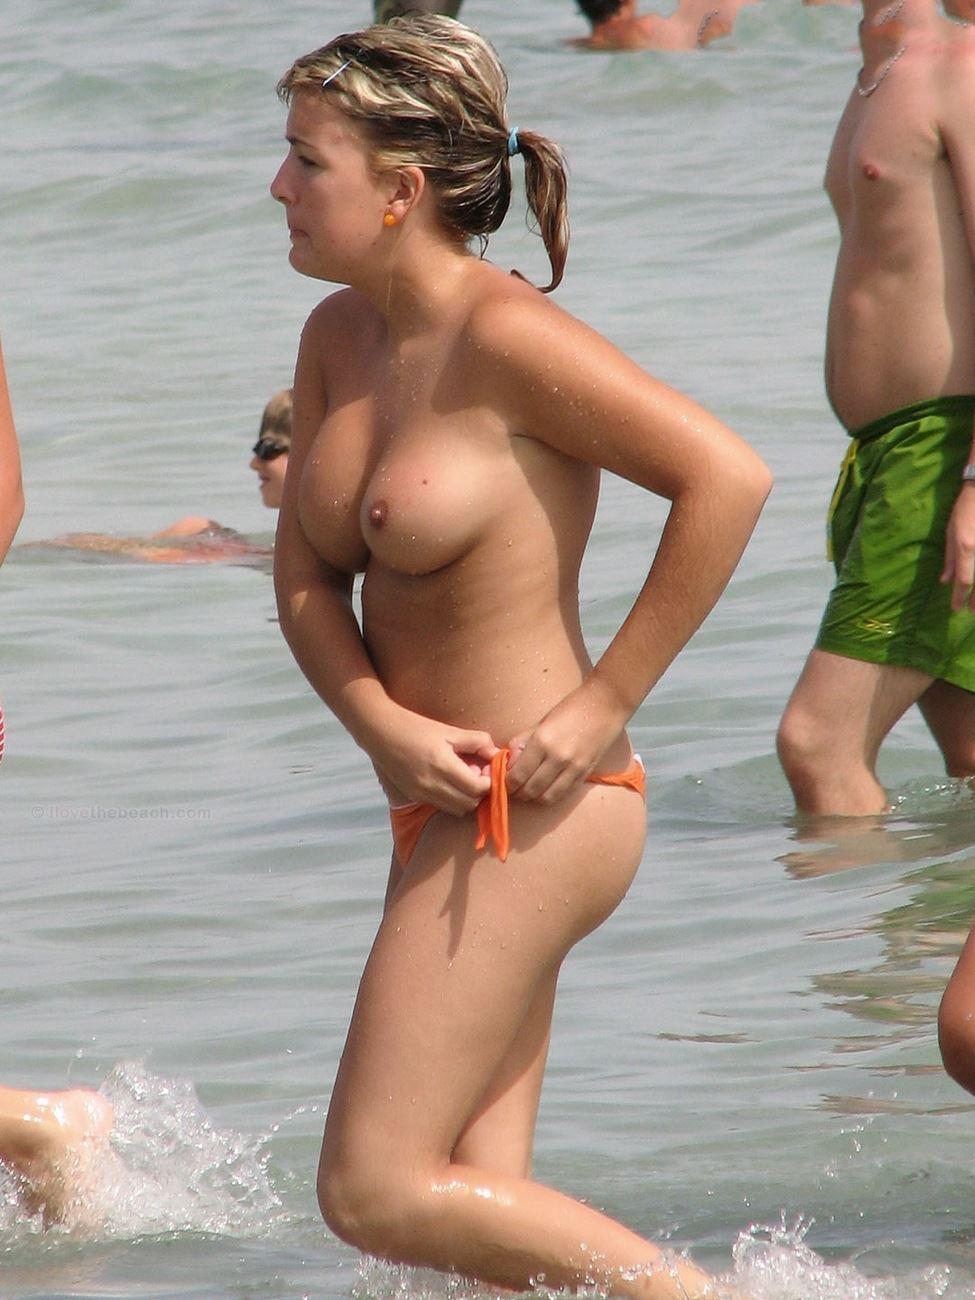 curvy body nude topless beach lady